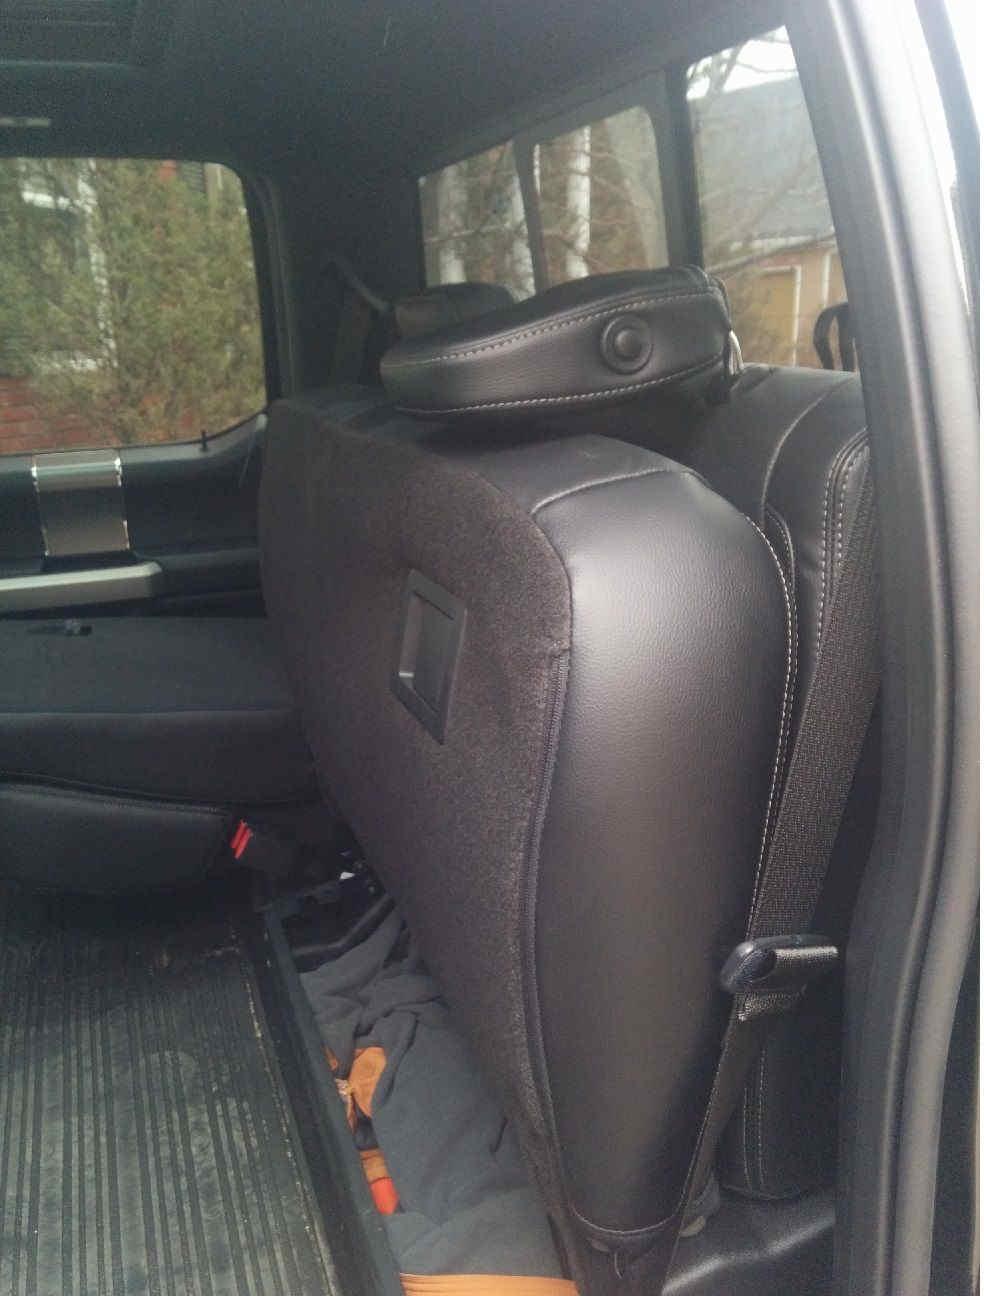 Ford F150 2015 Subwoofer Amplifier Retrofits (2)